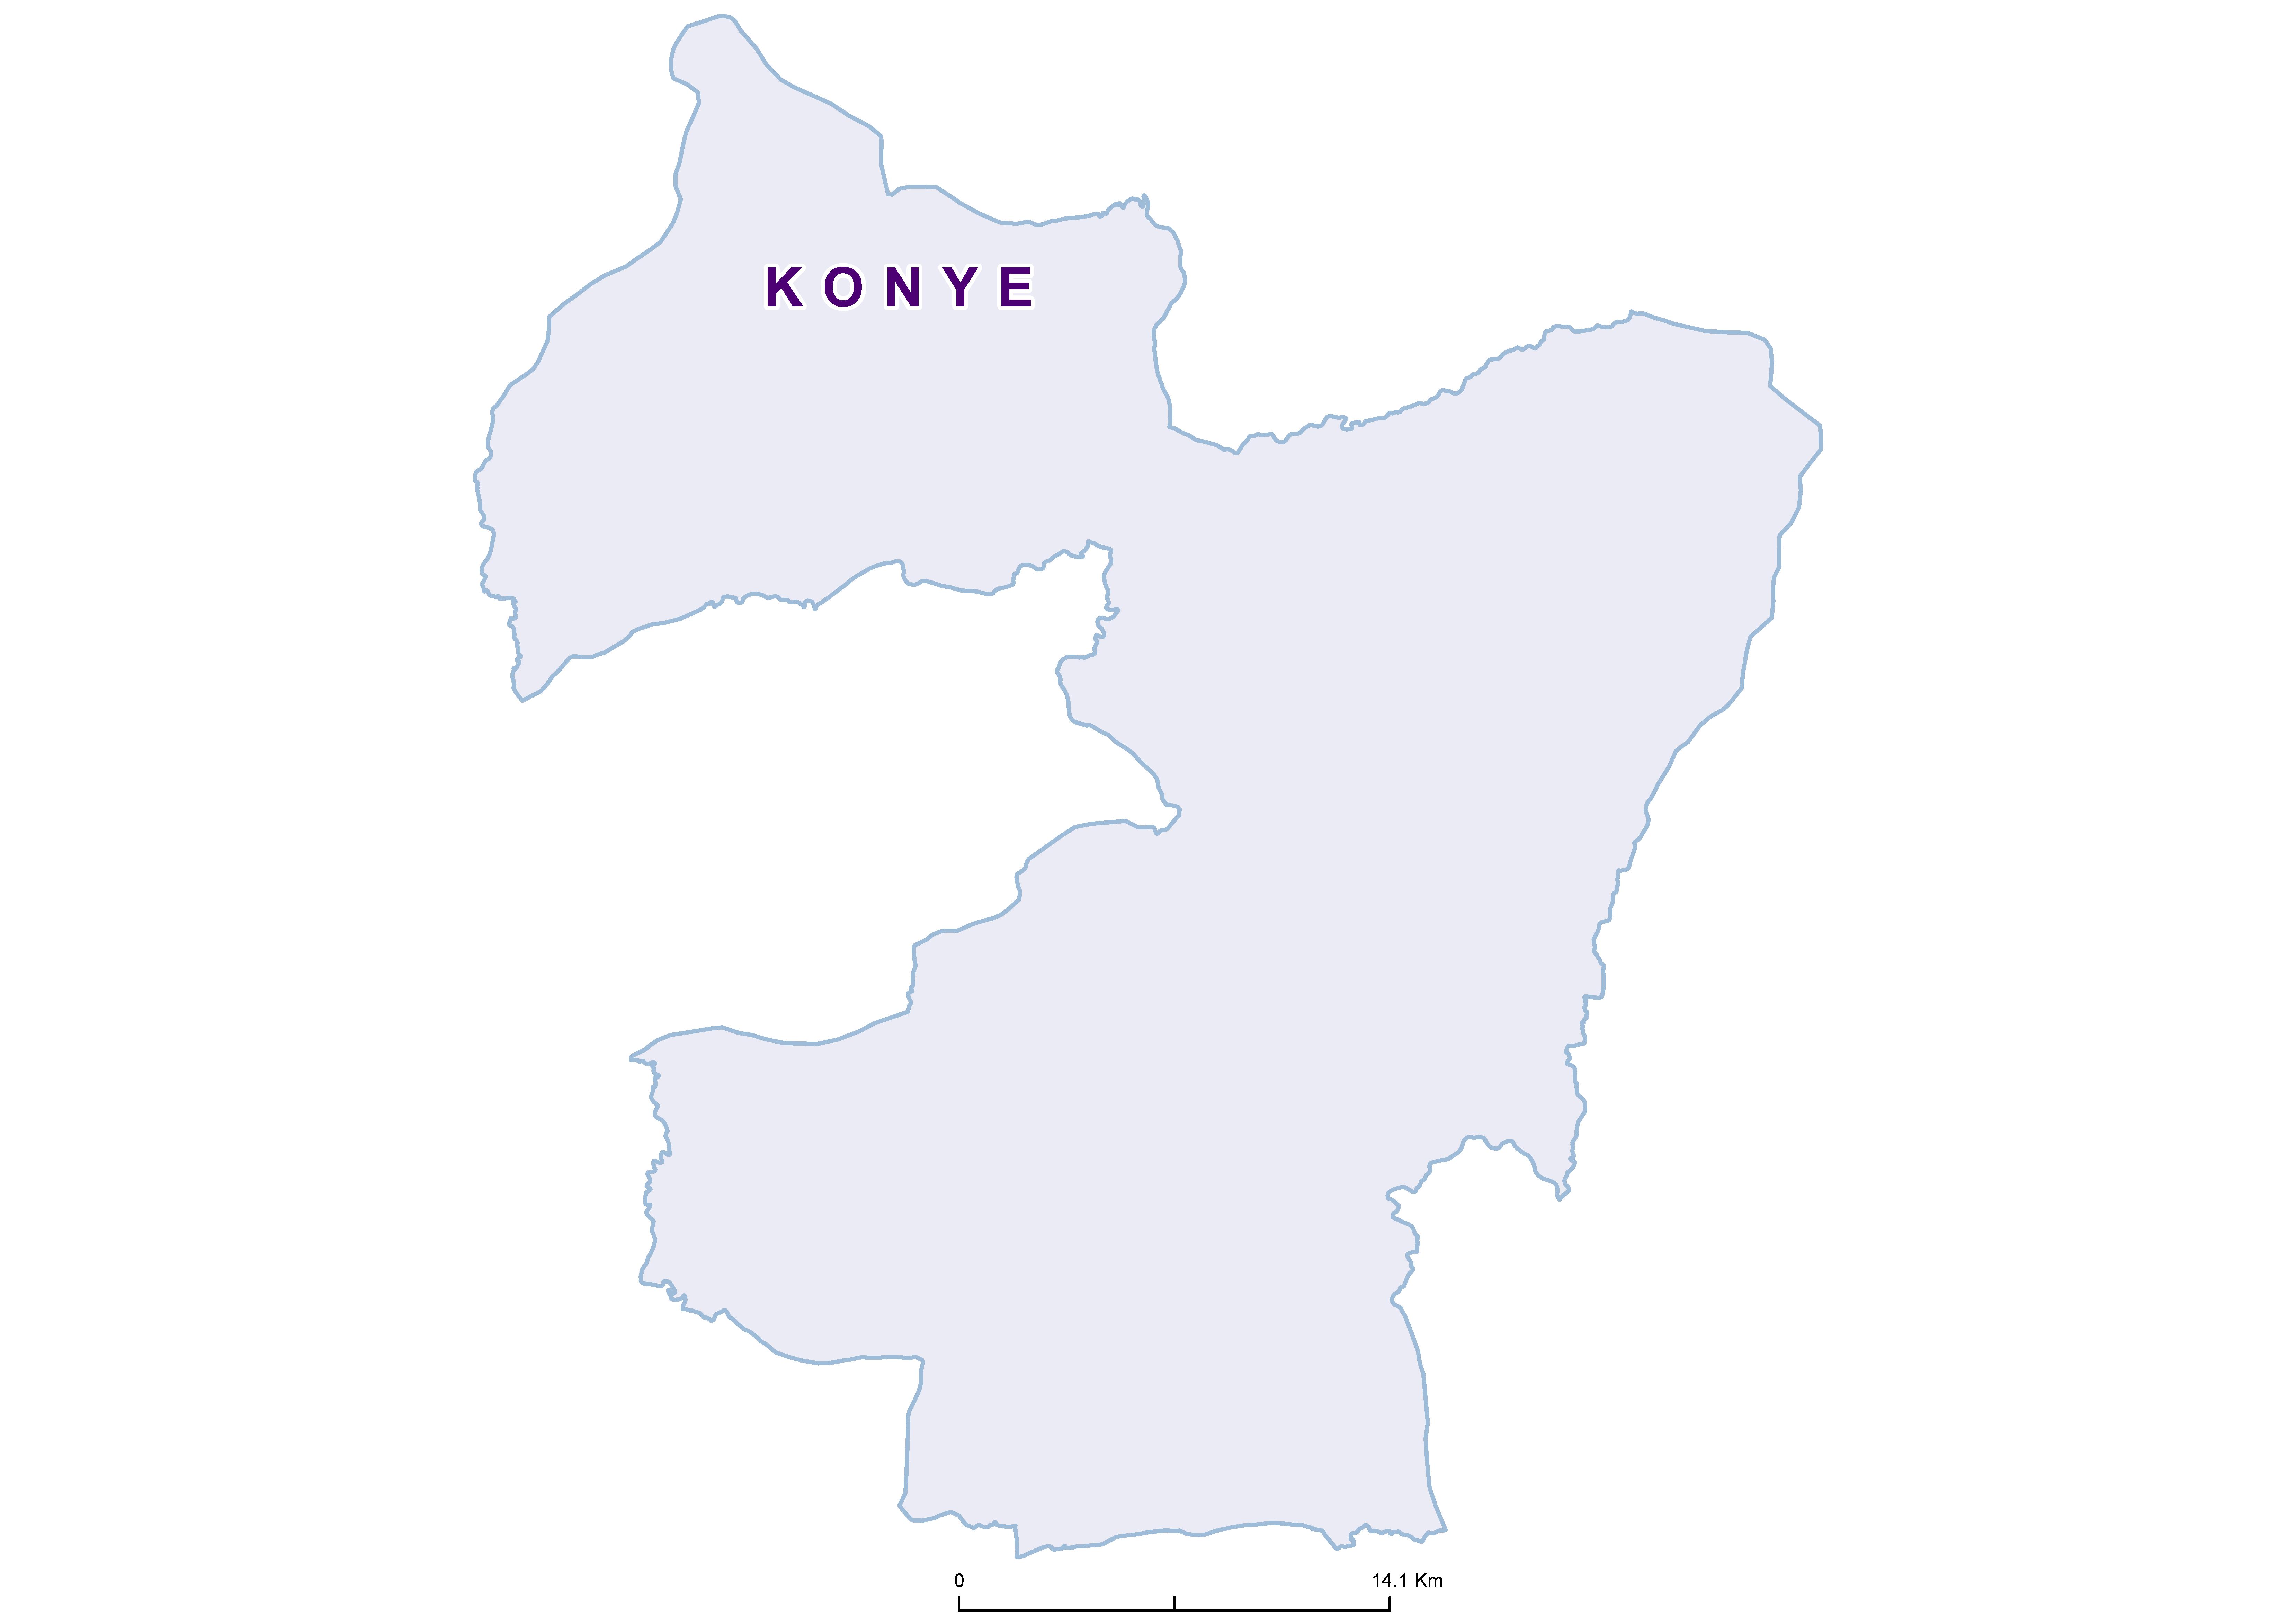 Konye Mean SCH 20180001